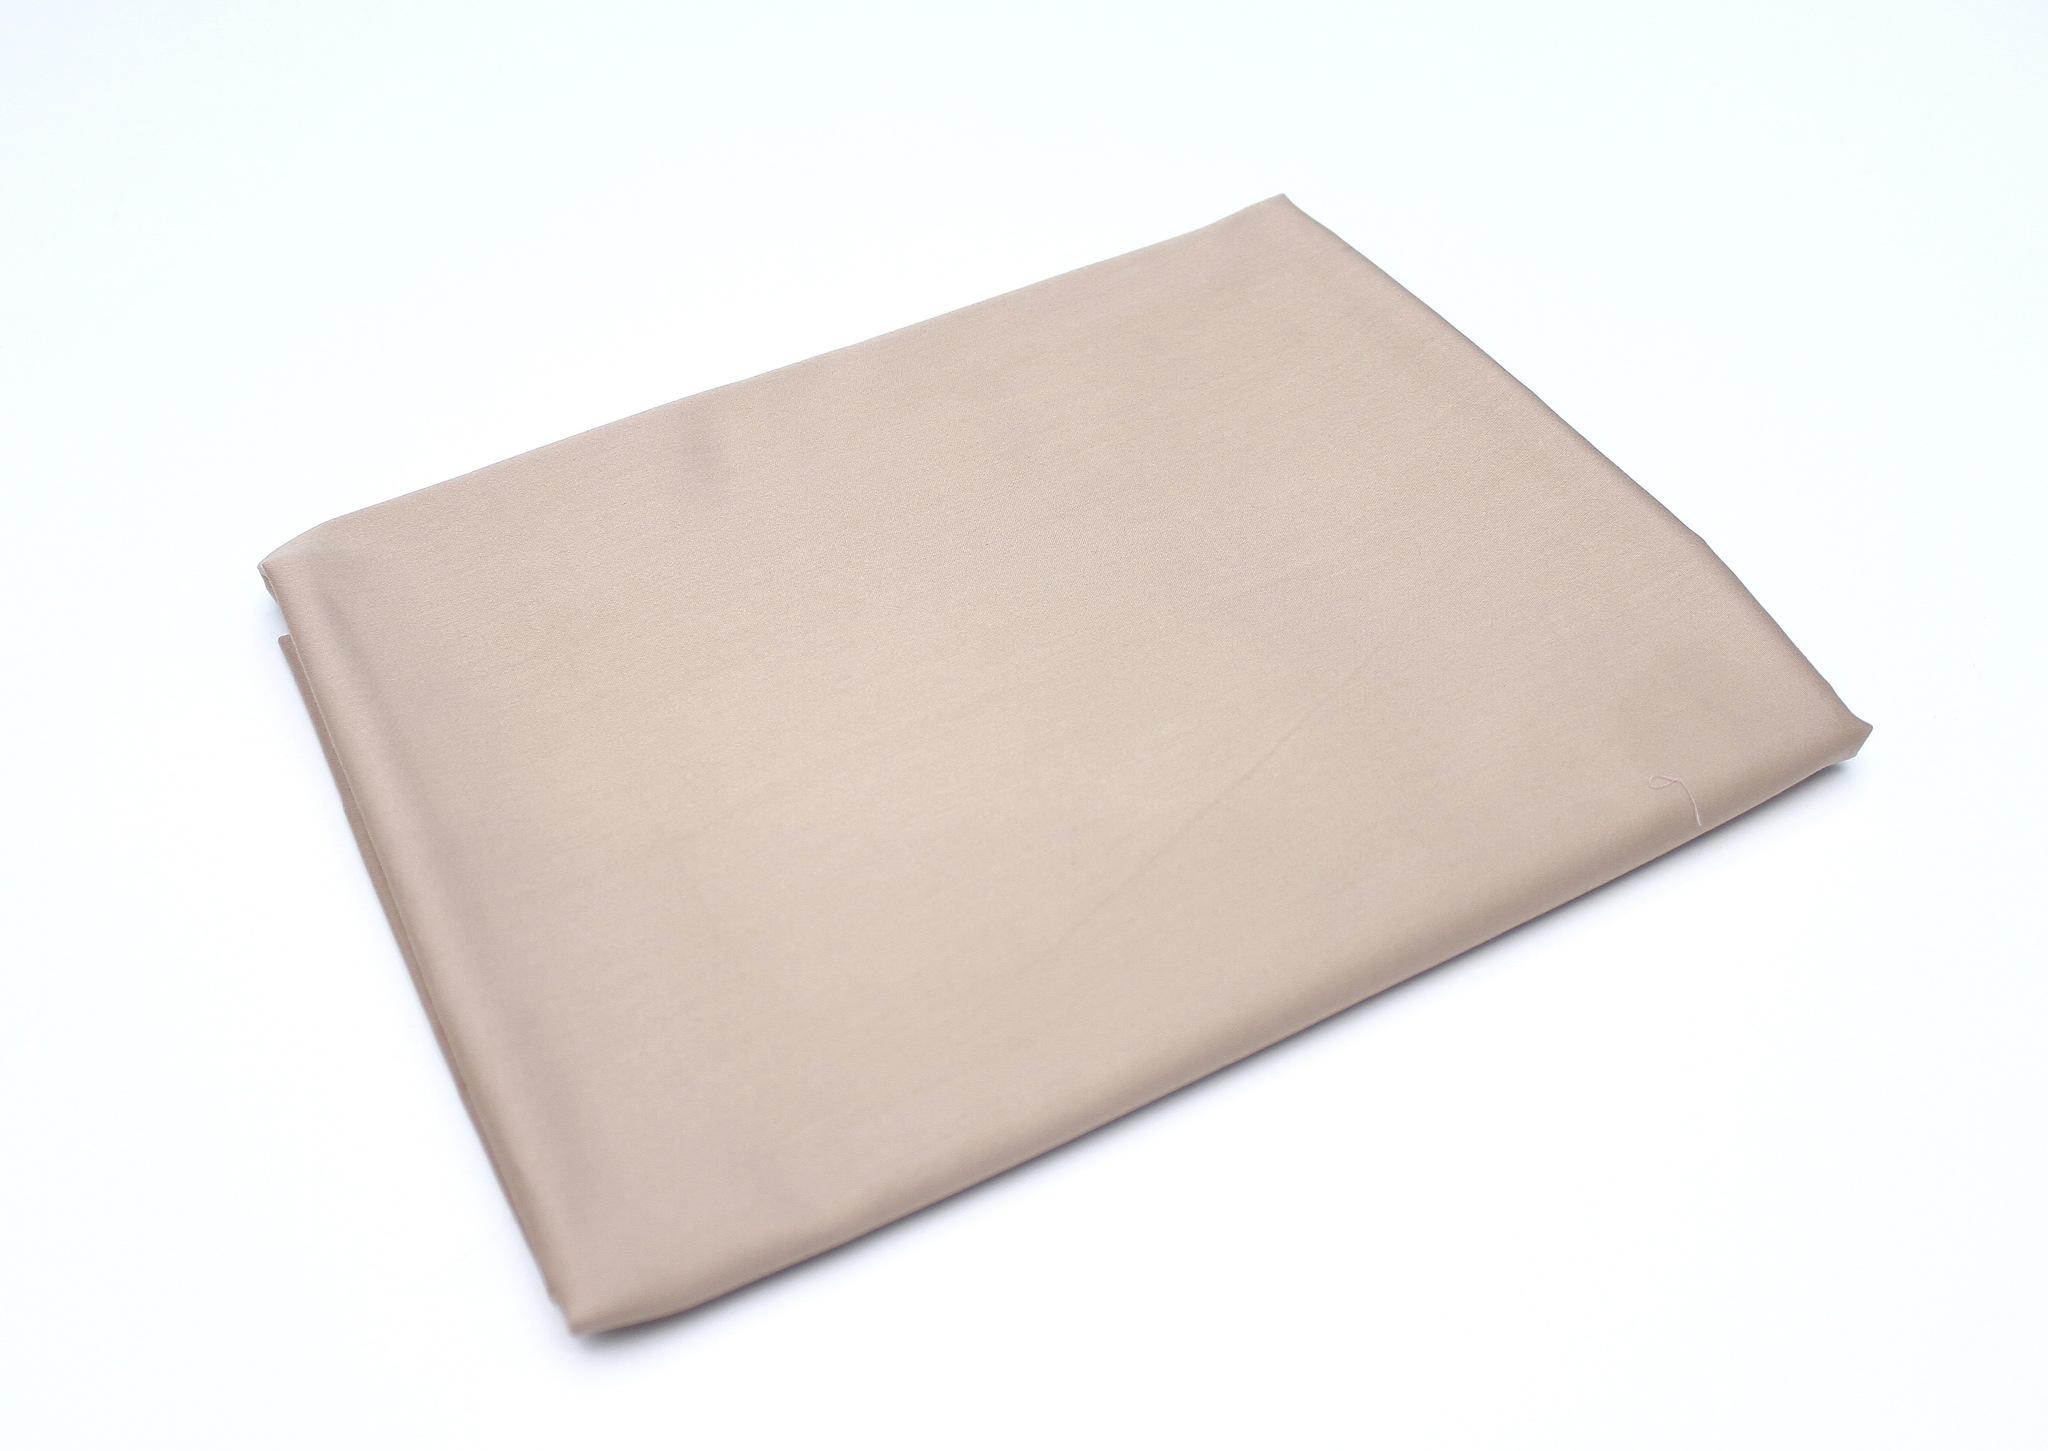 Карамель(сатин класса люкс,60s),250 см